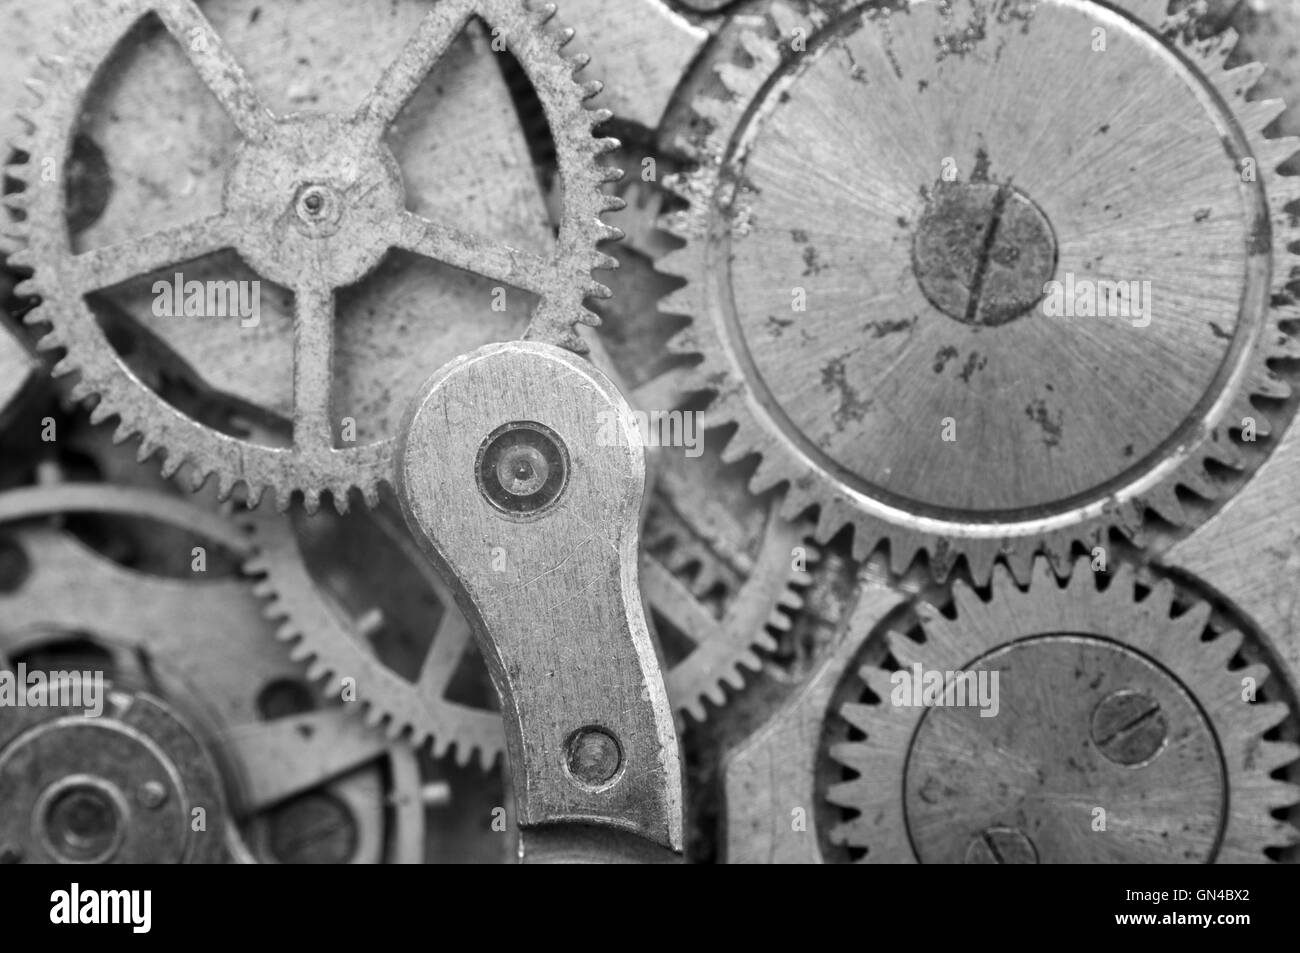 Black and white Metal Cogwheels in Oldest Rusty Clockwork, Macro. Concept Teamwork, Idea Technology - Stock Image